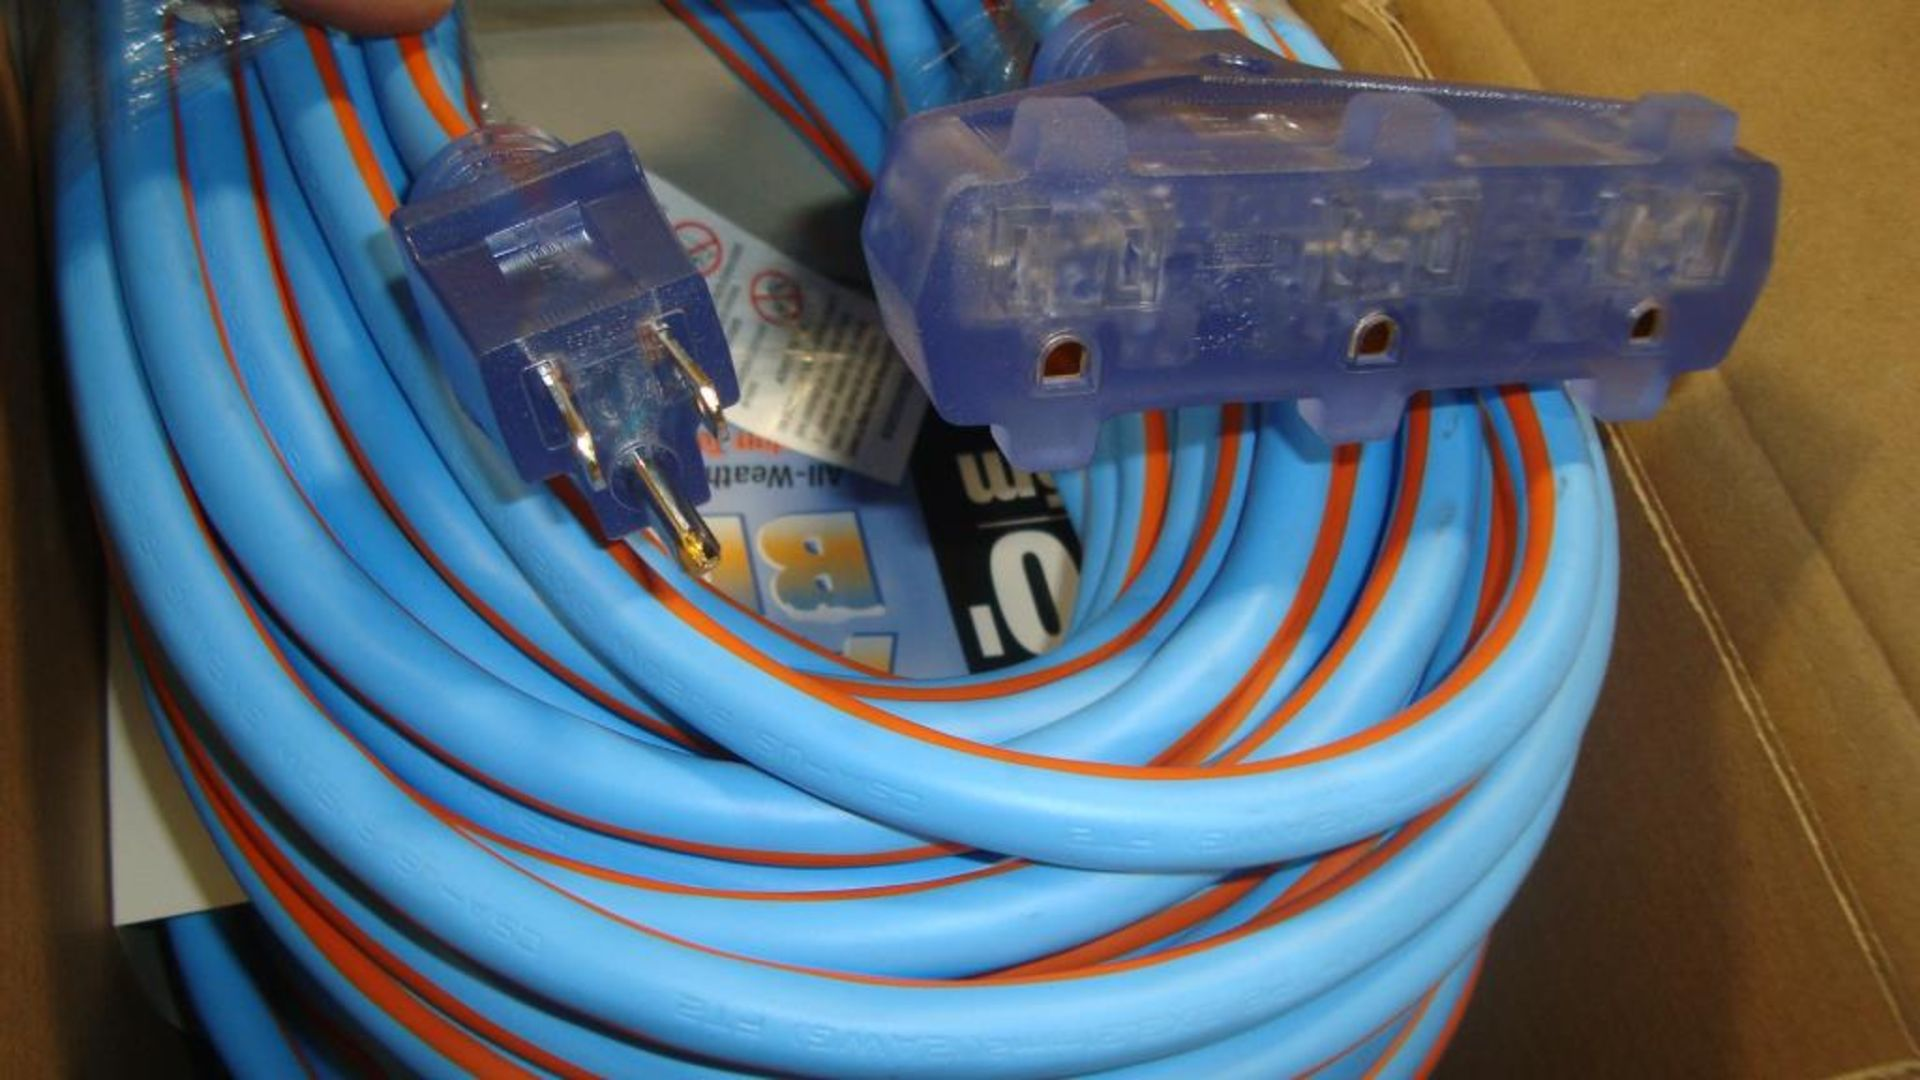 Extension Cords. Lot: 90 Total (30 Boxes - 3 ea.) Prime Wire & Cable pn# LT630835 Arctic Blue 100 - Image 4 of 9